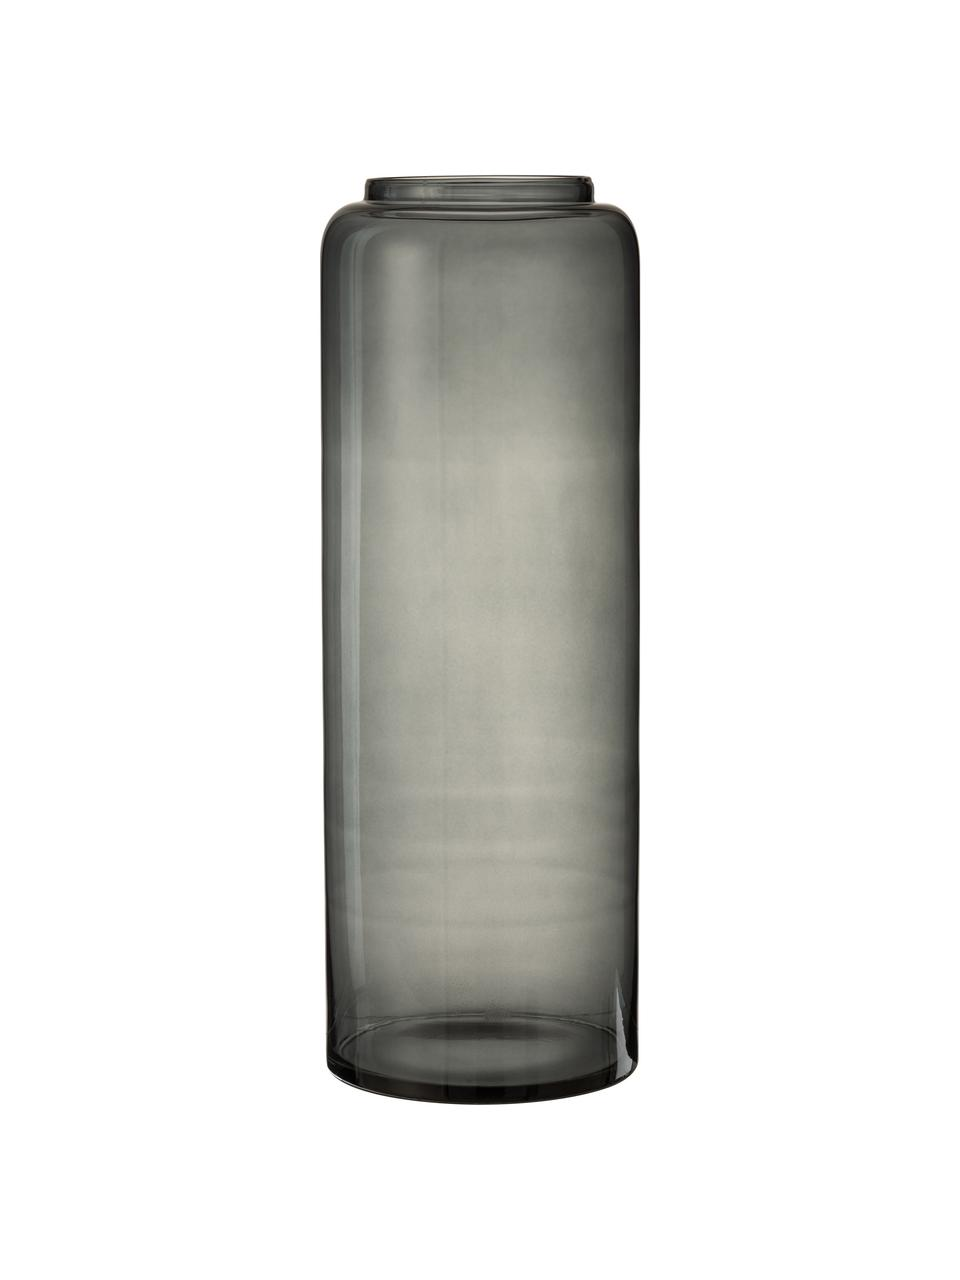 Vaso alto in vetro Right, Vetro, Grigio, Ø 25 x Alt. 70 cm